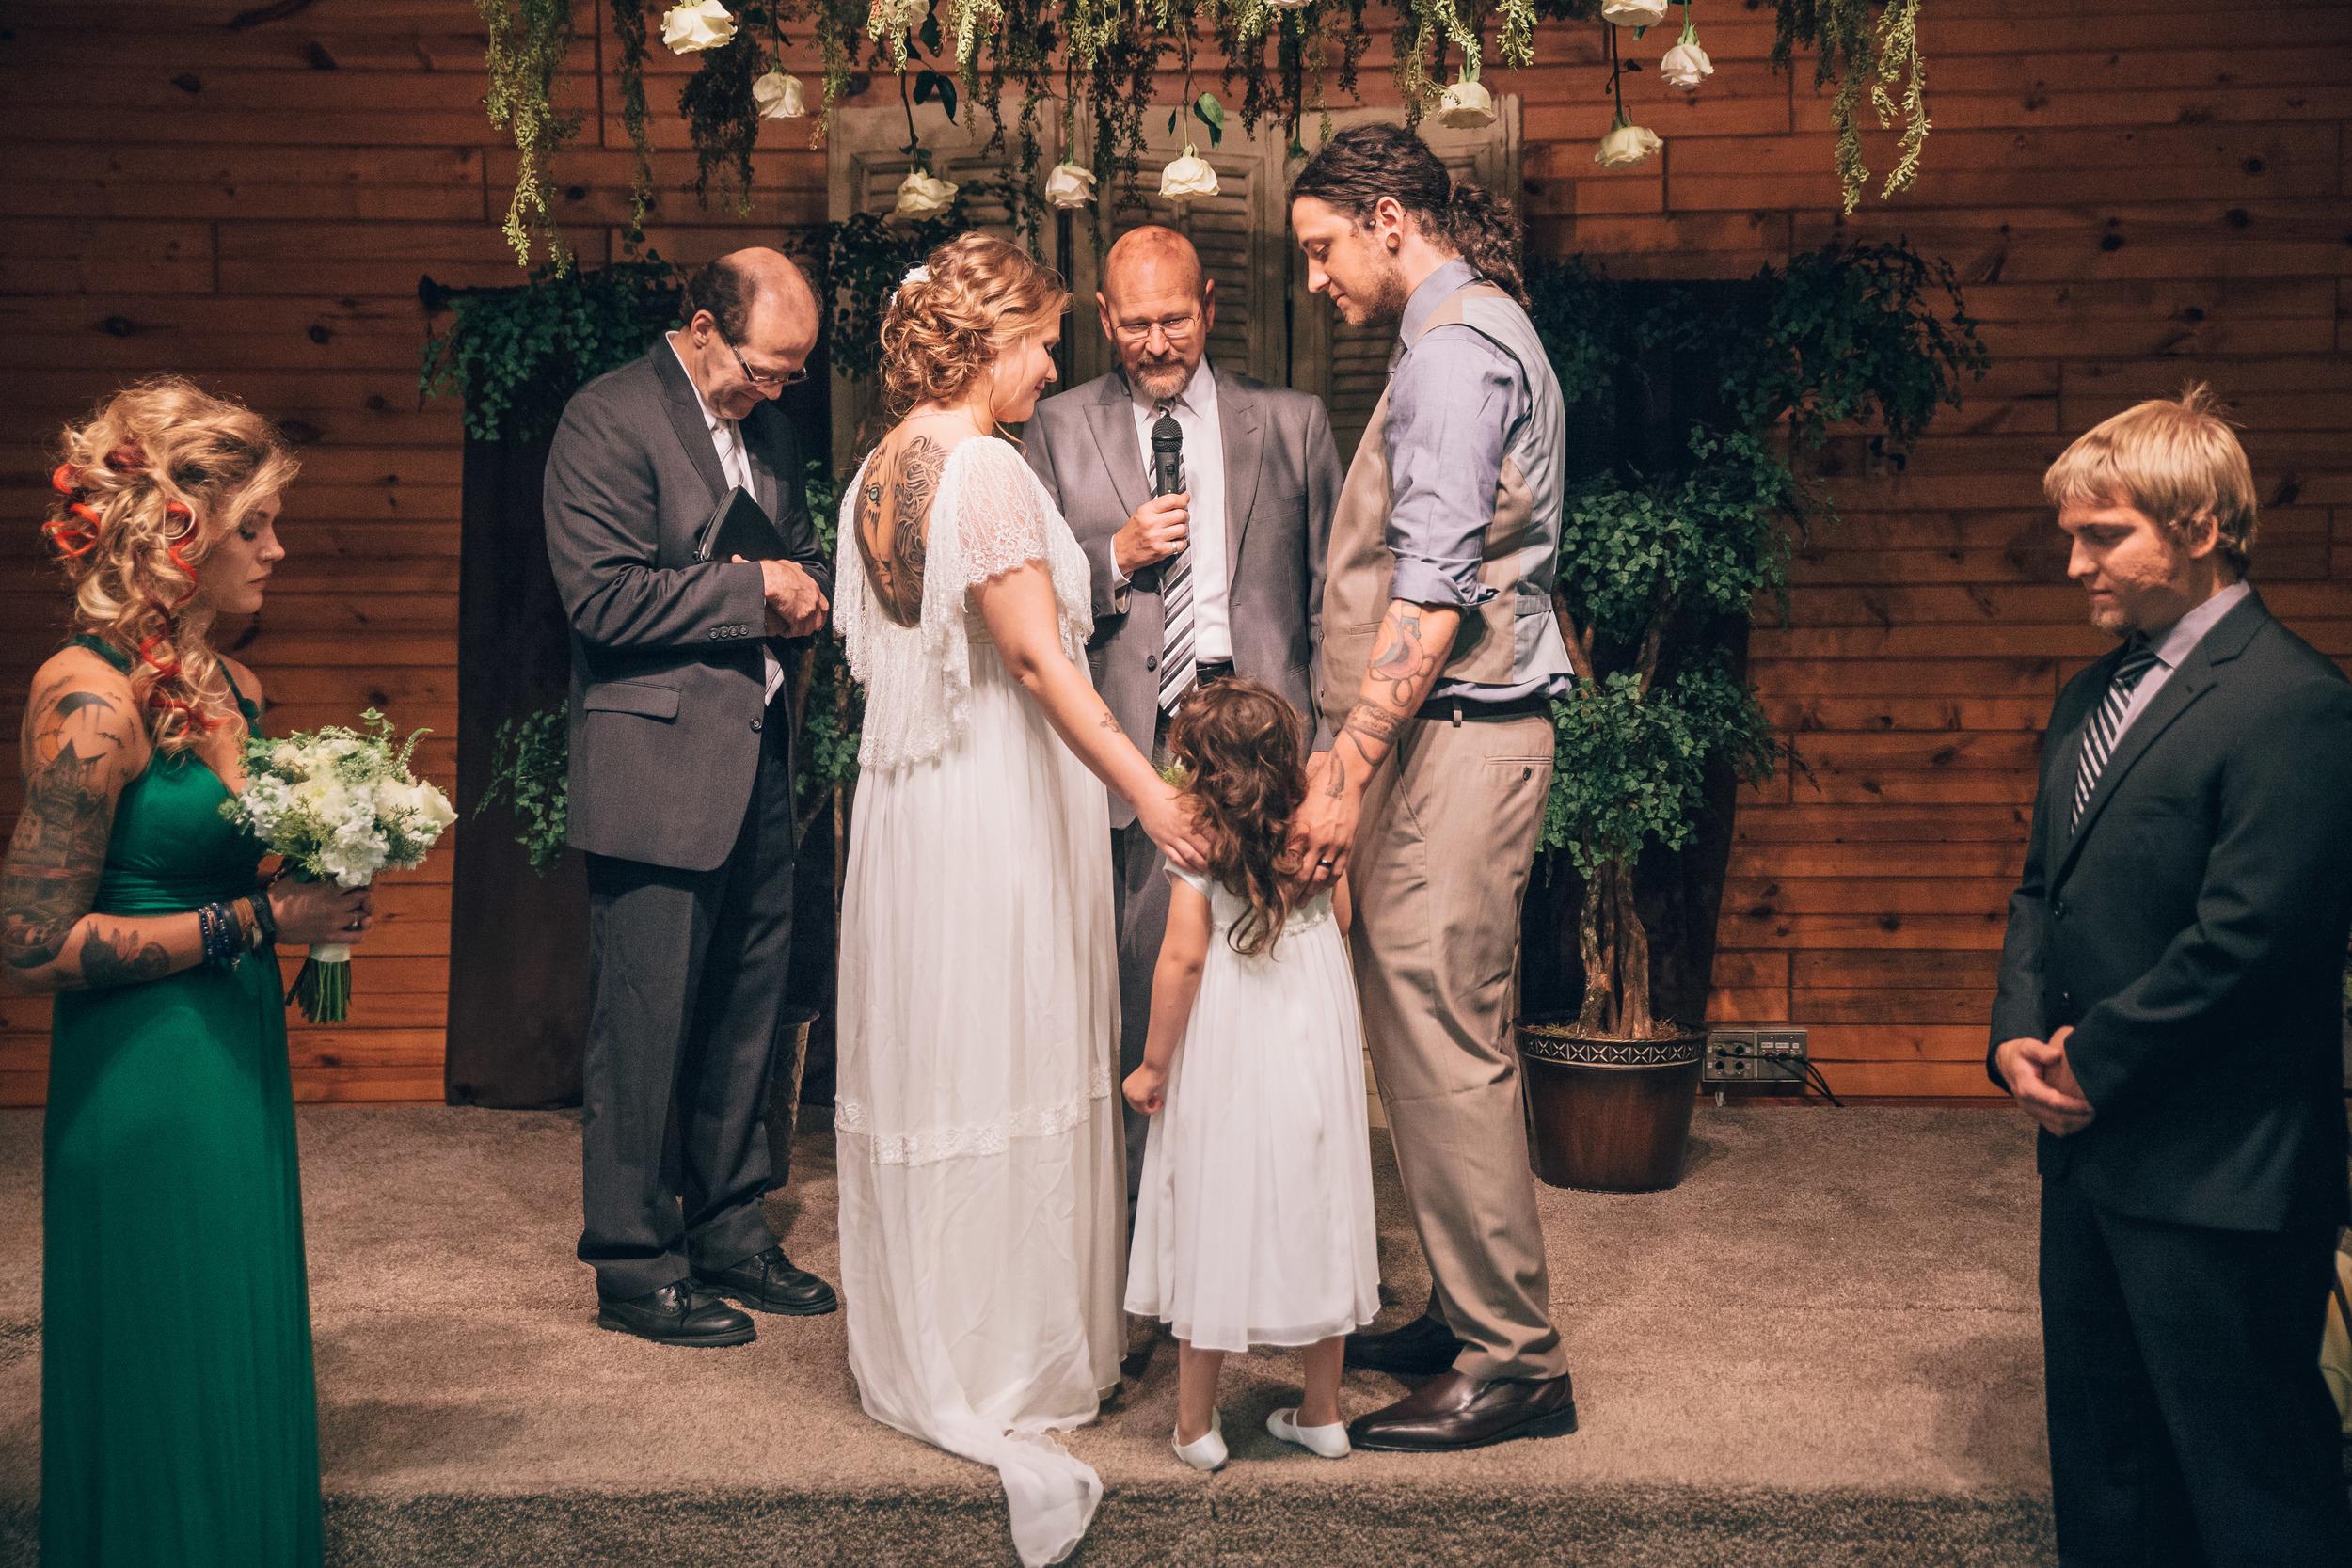 irwin wedding blog-40.jpg